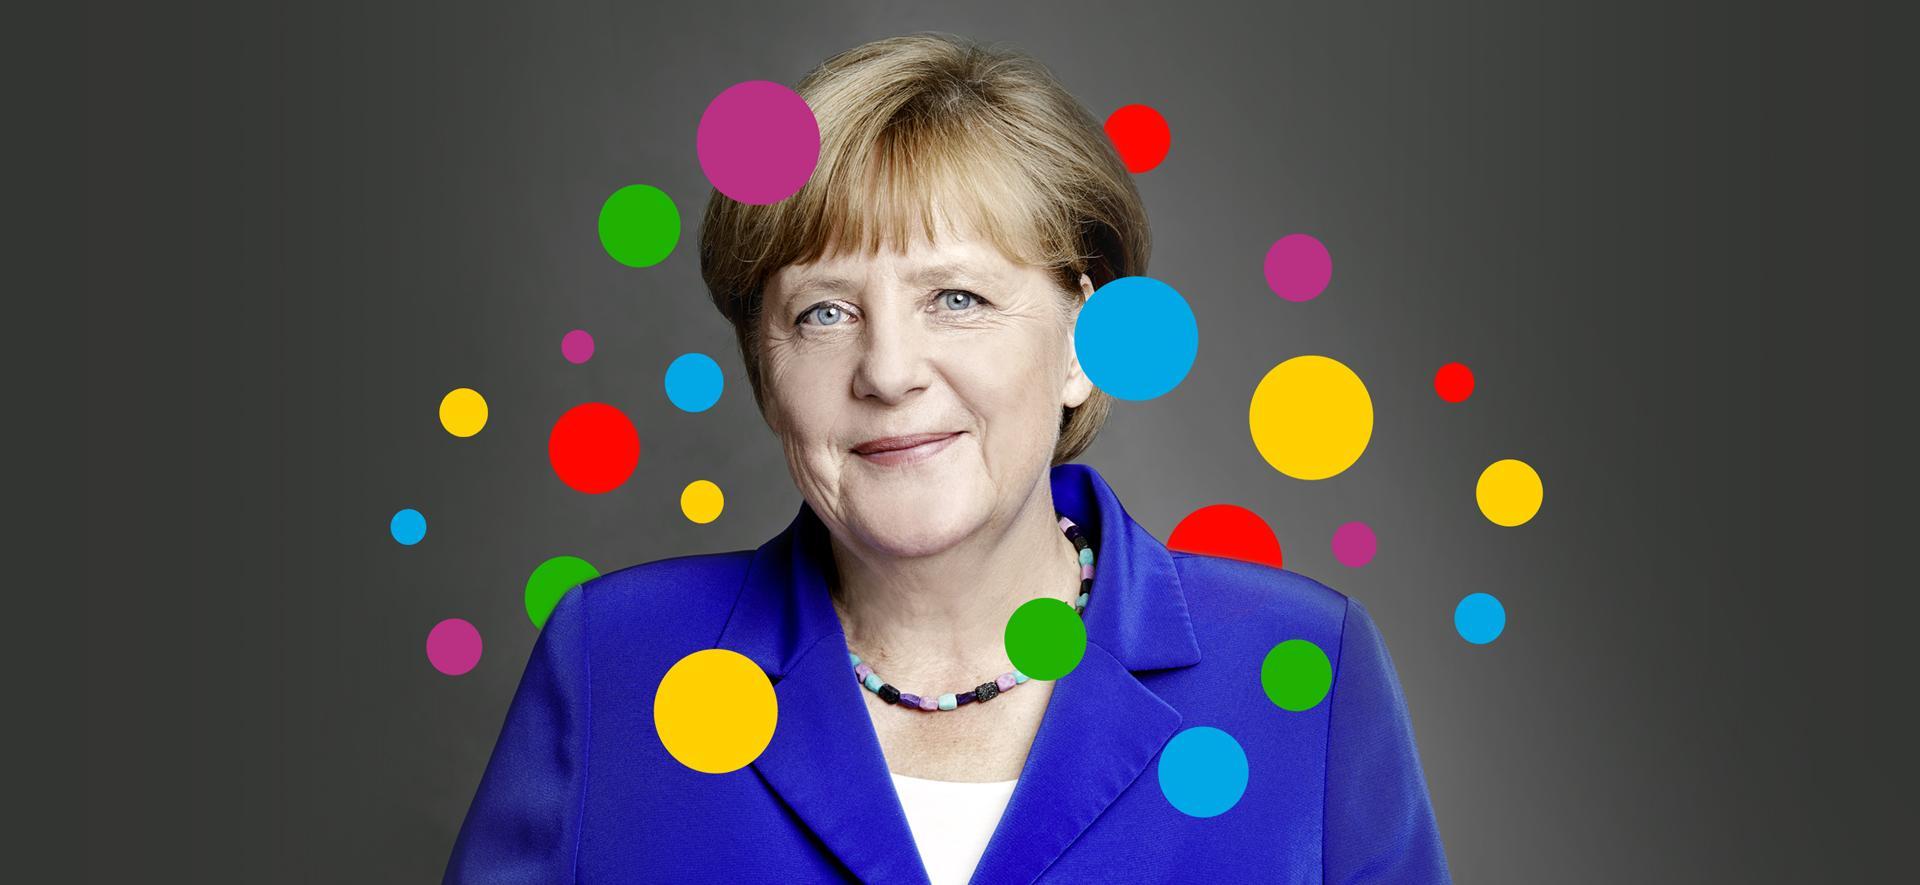 tysk_konstellation_topbillede10.jpg